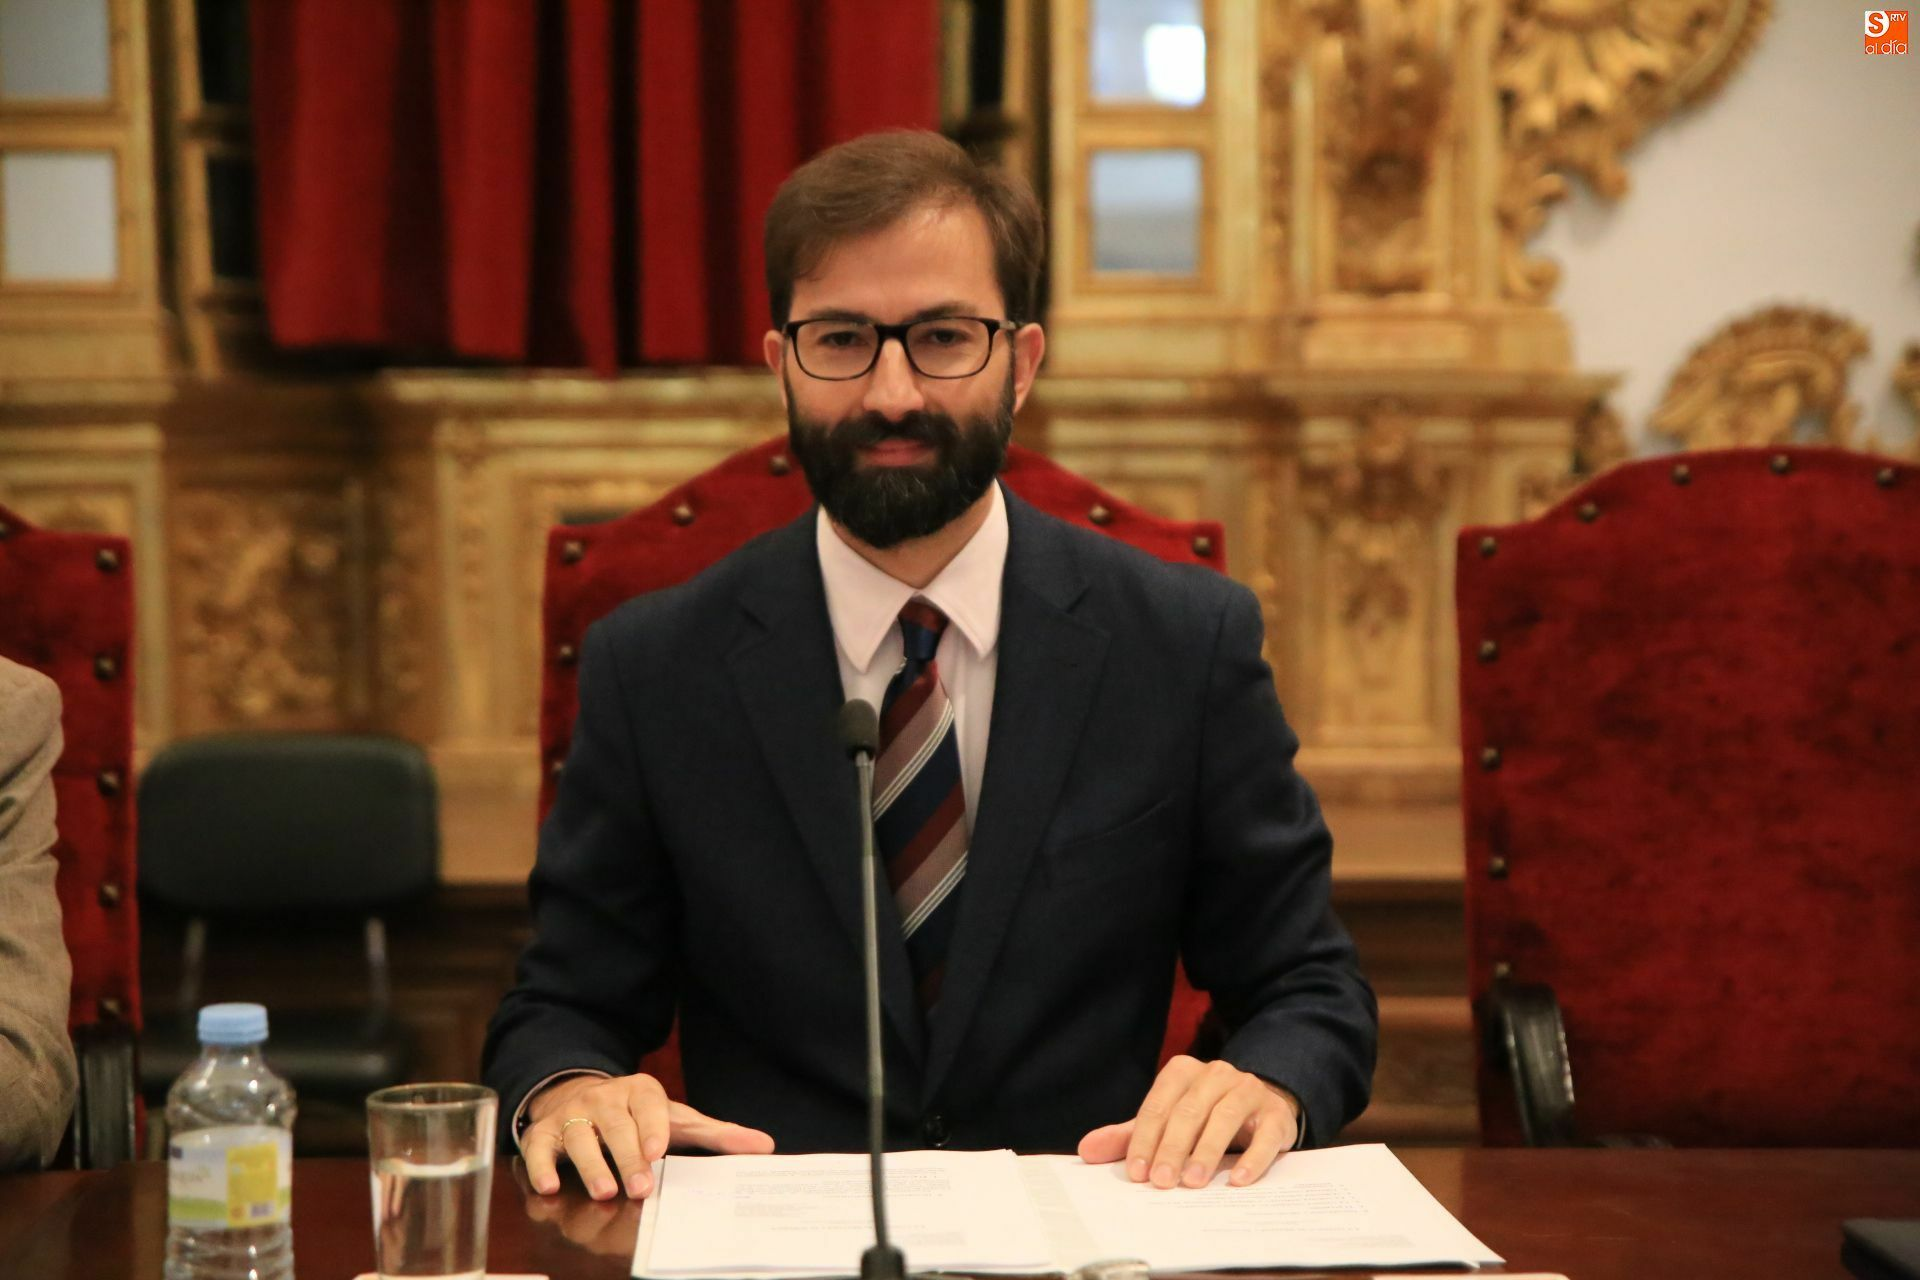 Pedro Castelao